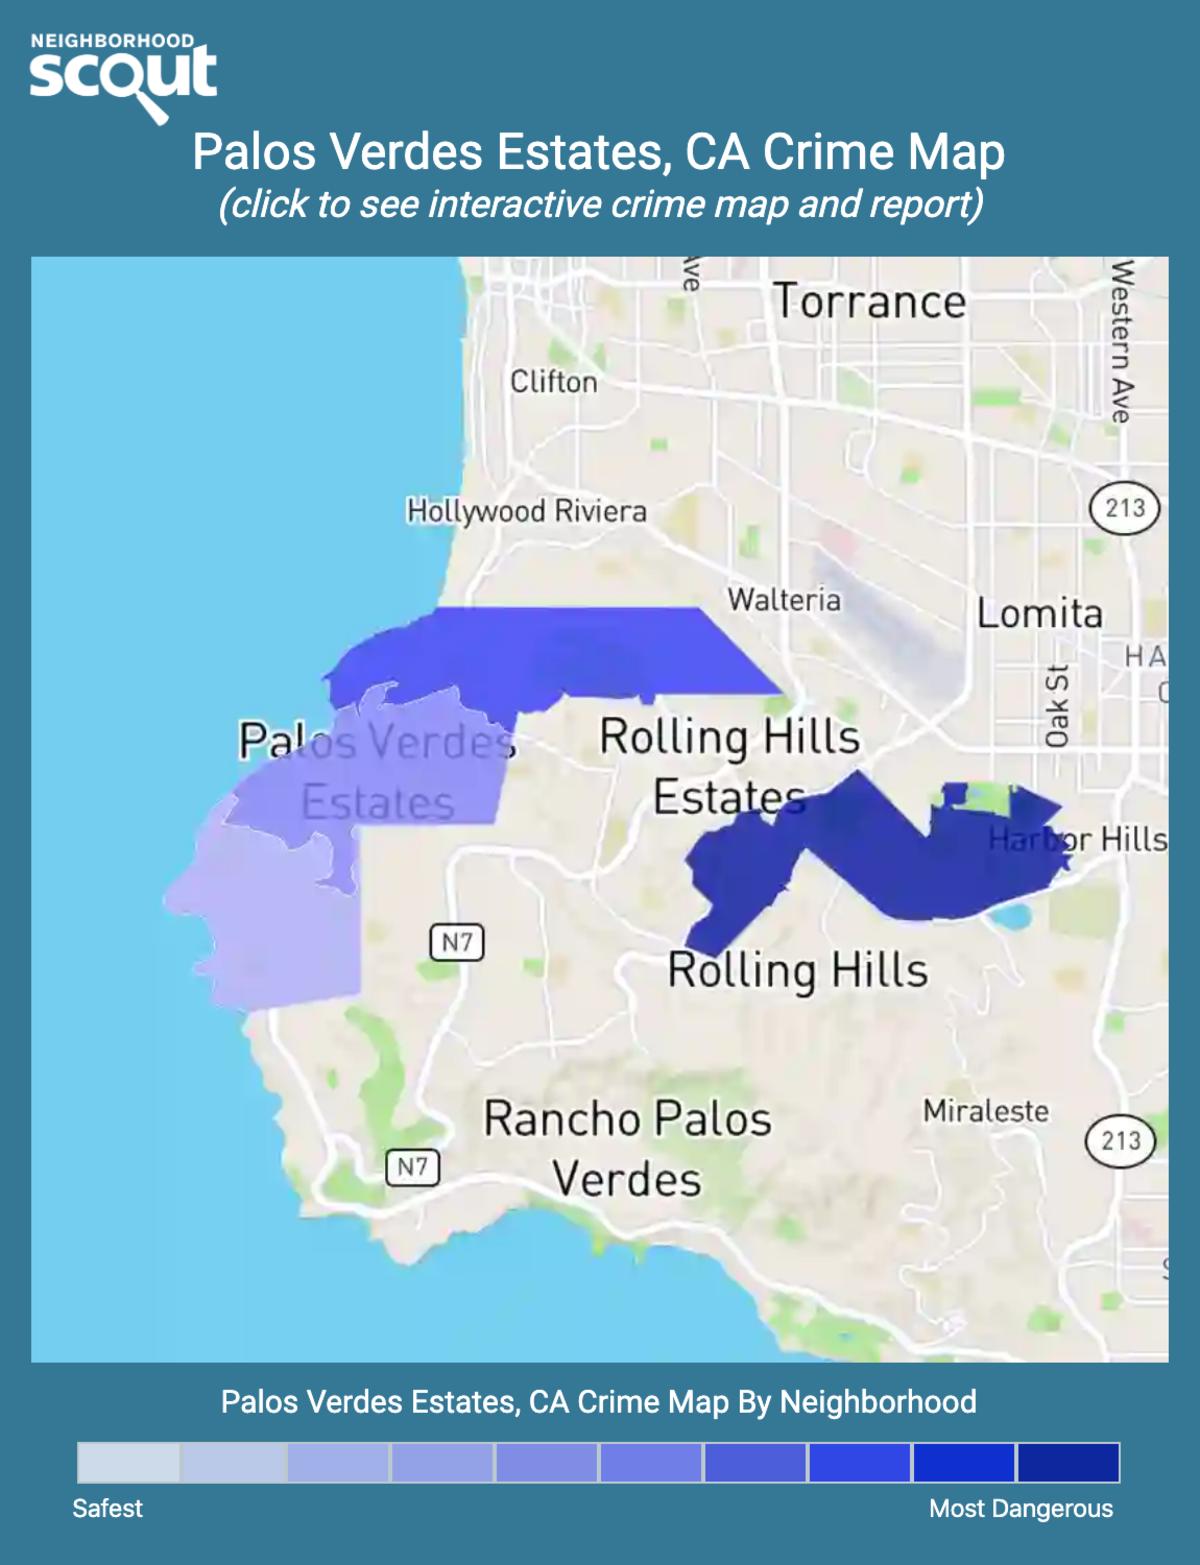 Palos Verdes Estates, California crime map